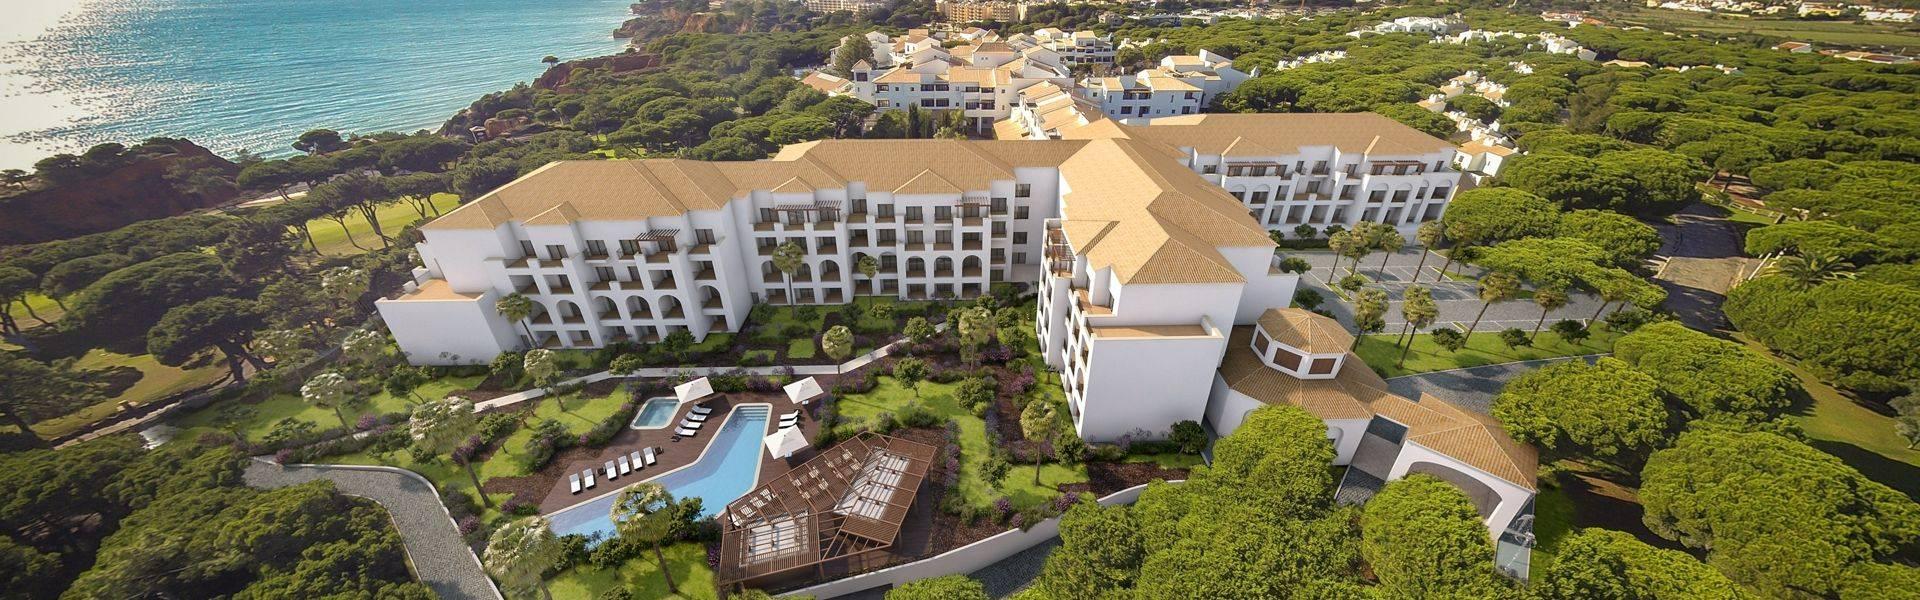 Pine Cliffs Ocean Suites Property 4.jpg